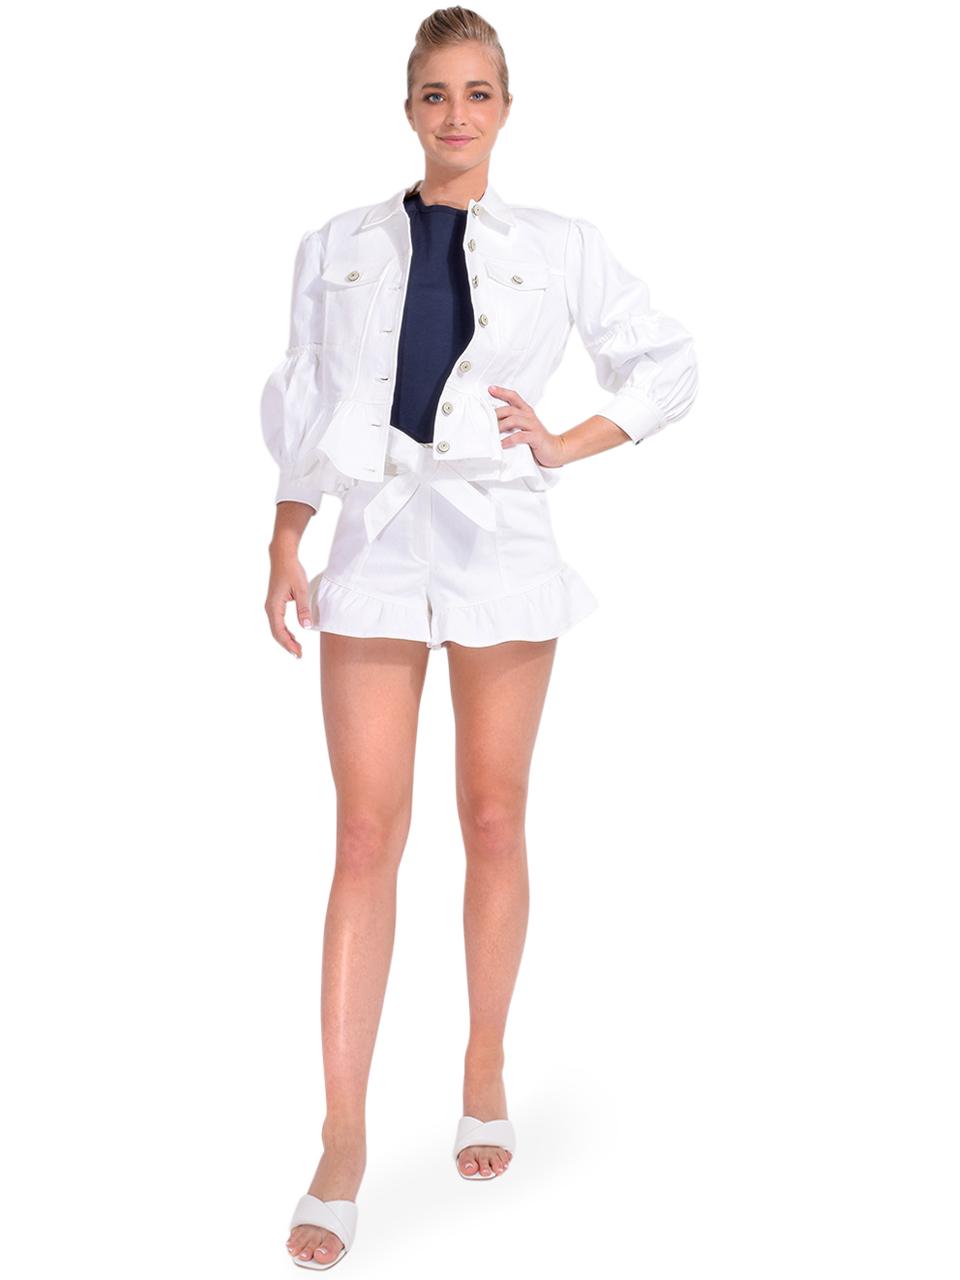 Cinq à Sept Lizzie Peplum Jacket Full Outfit